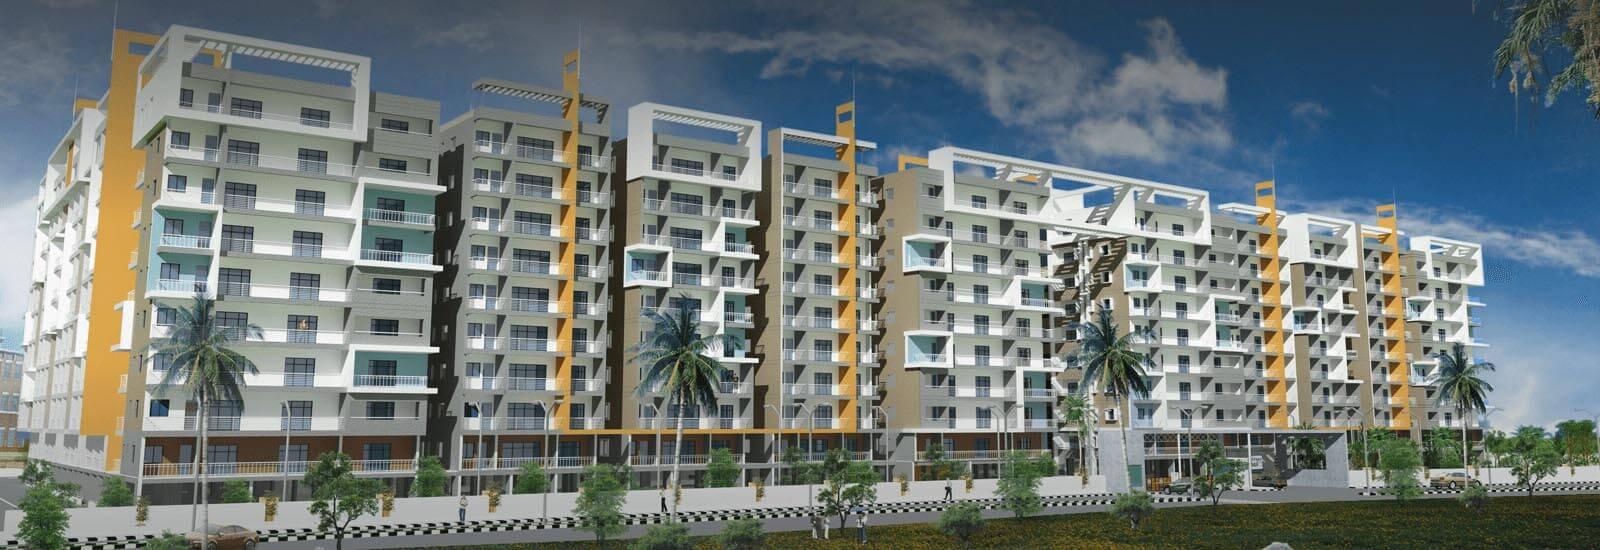 Western Plaza Manikonda Hyderabad 8887